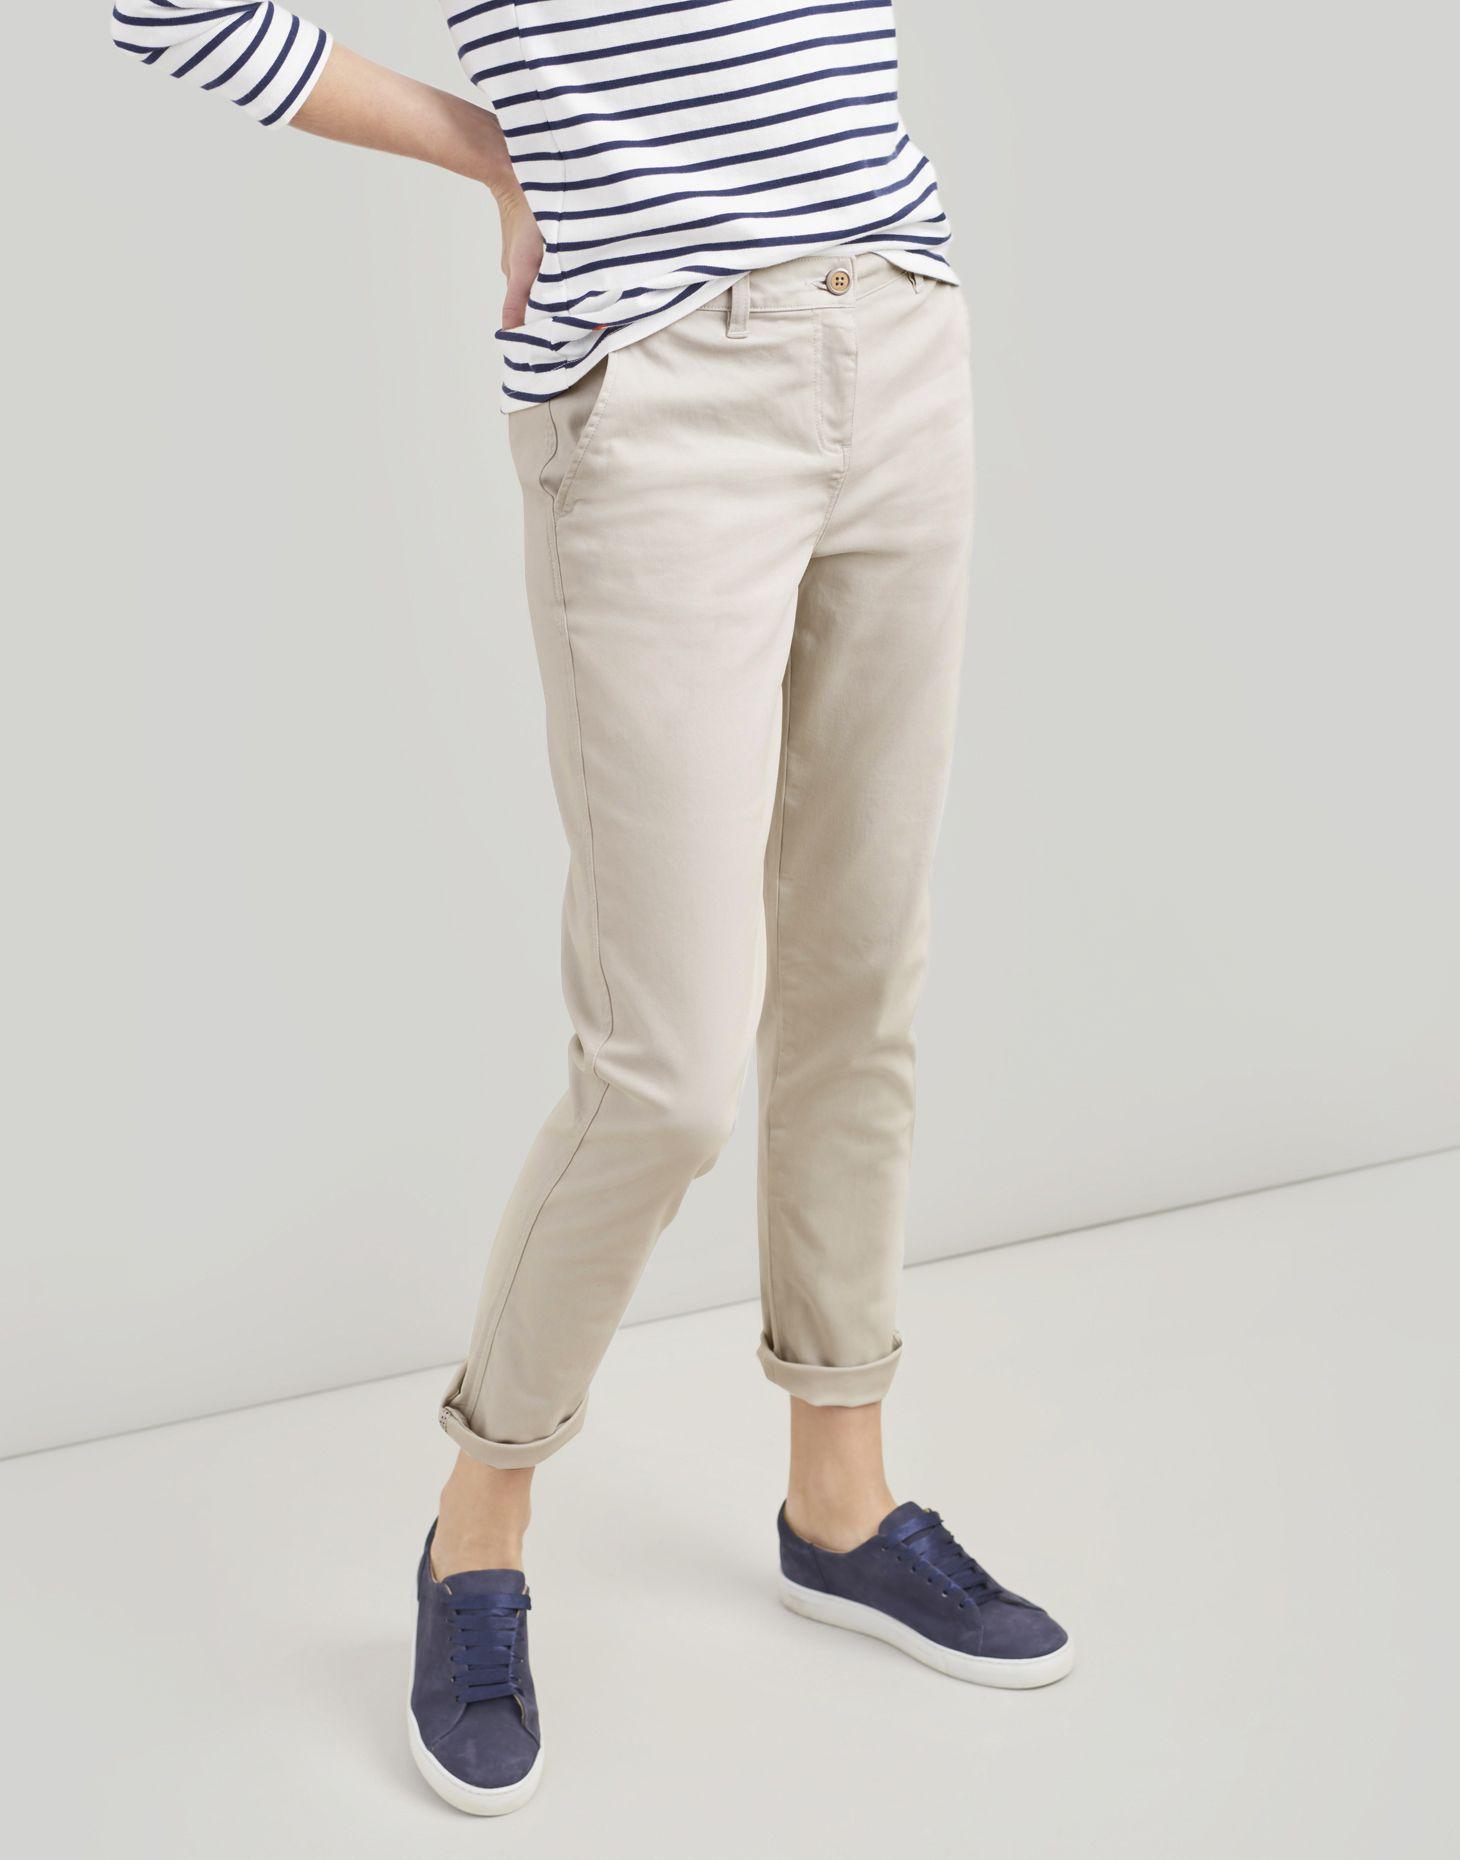 Pantalones Joules Hesford Para Mujer Pantalones Chino Azul Marino Todas Las Tallas Ropa Calzado Y Complementos Aniversarioqroo Cozumel Gob Mx